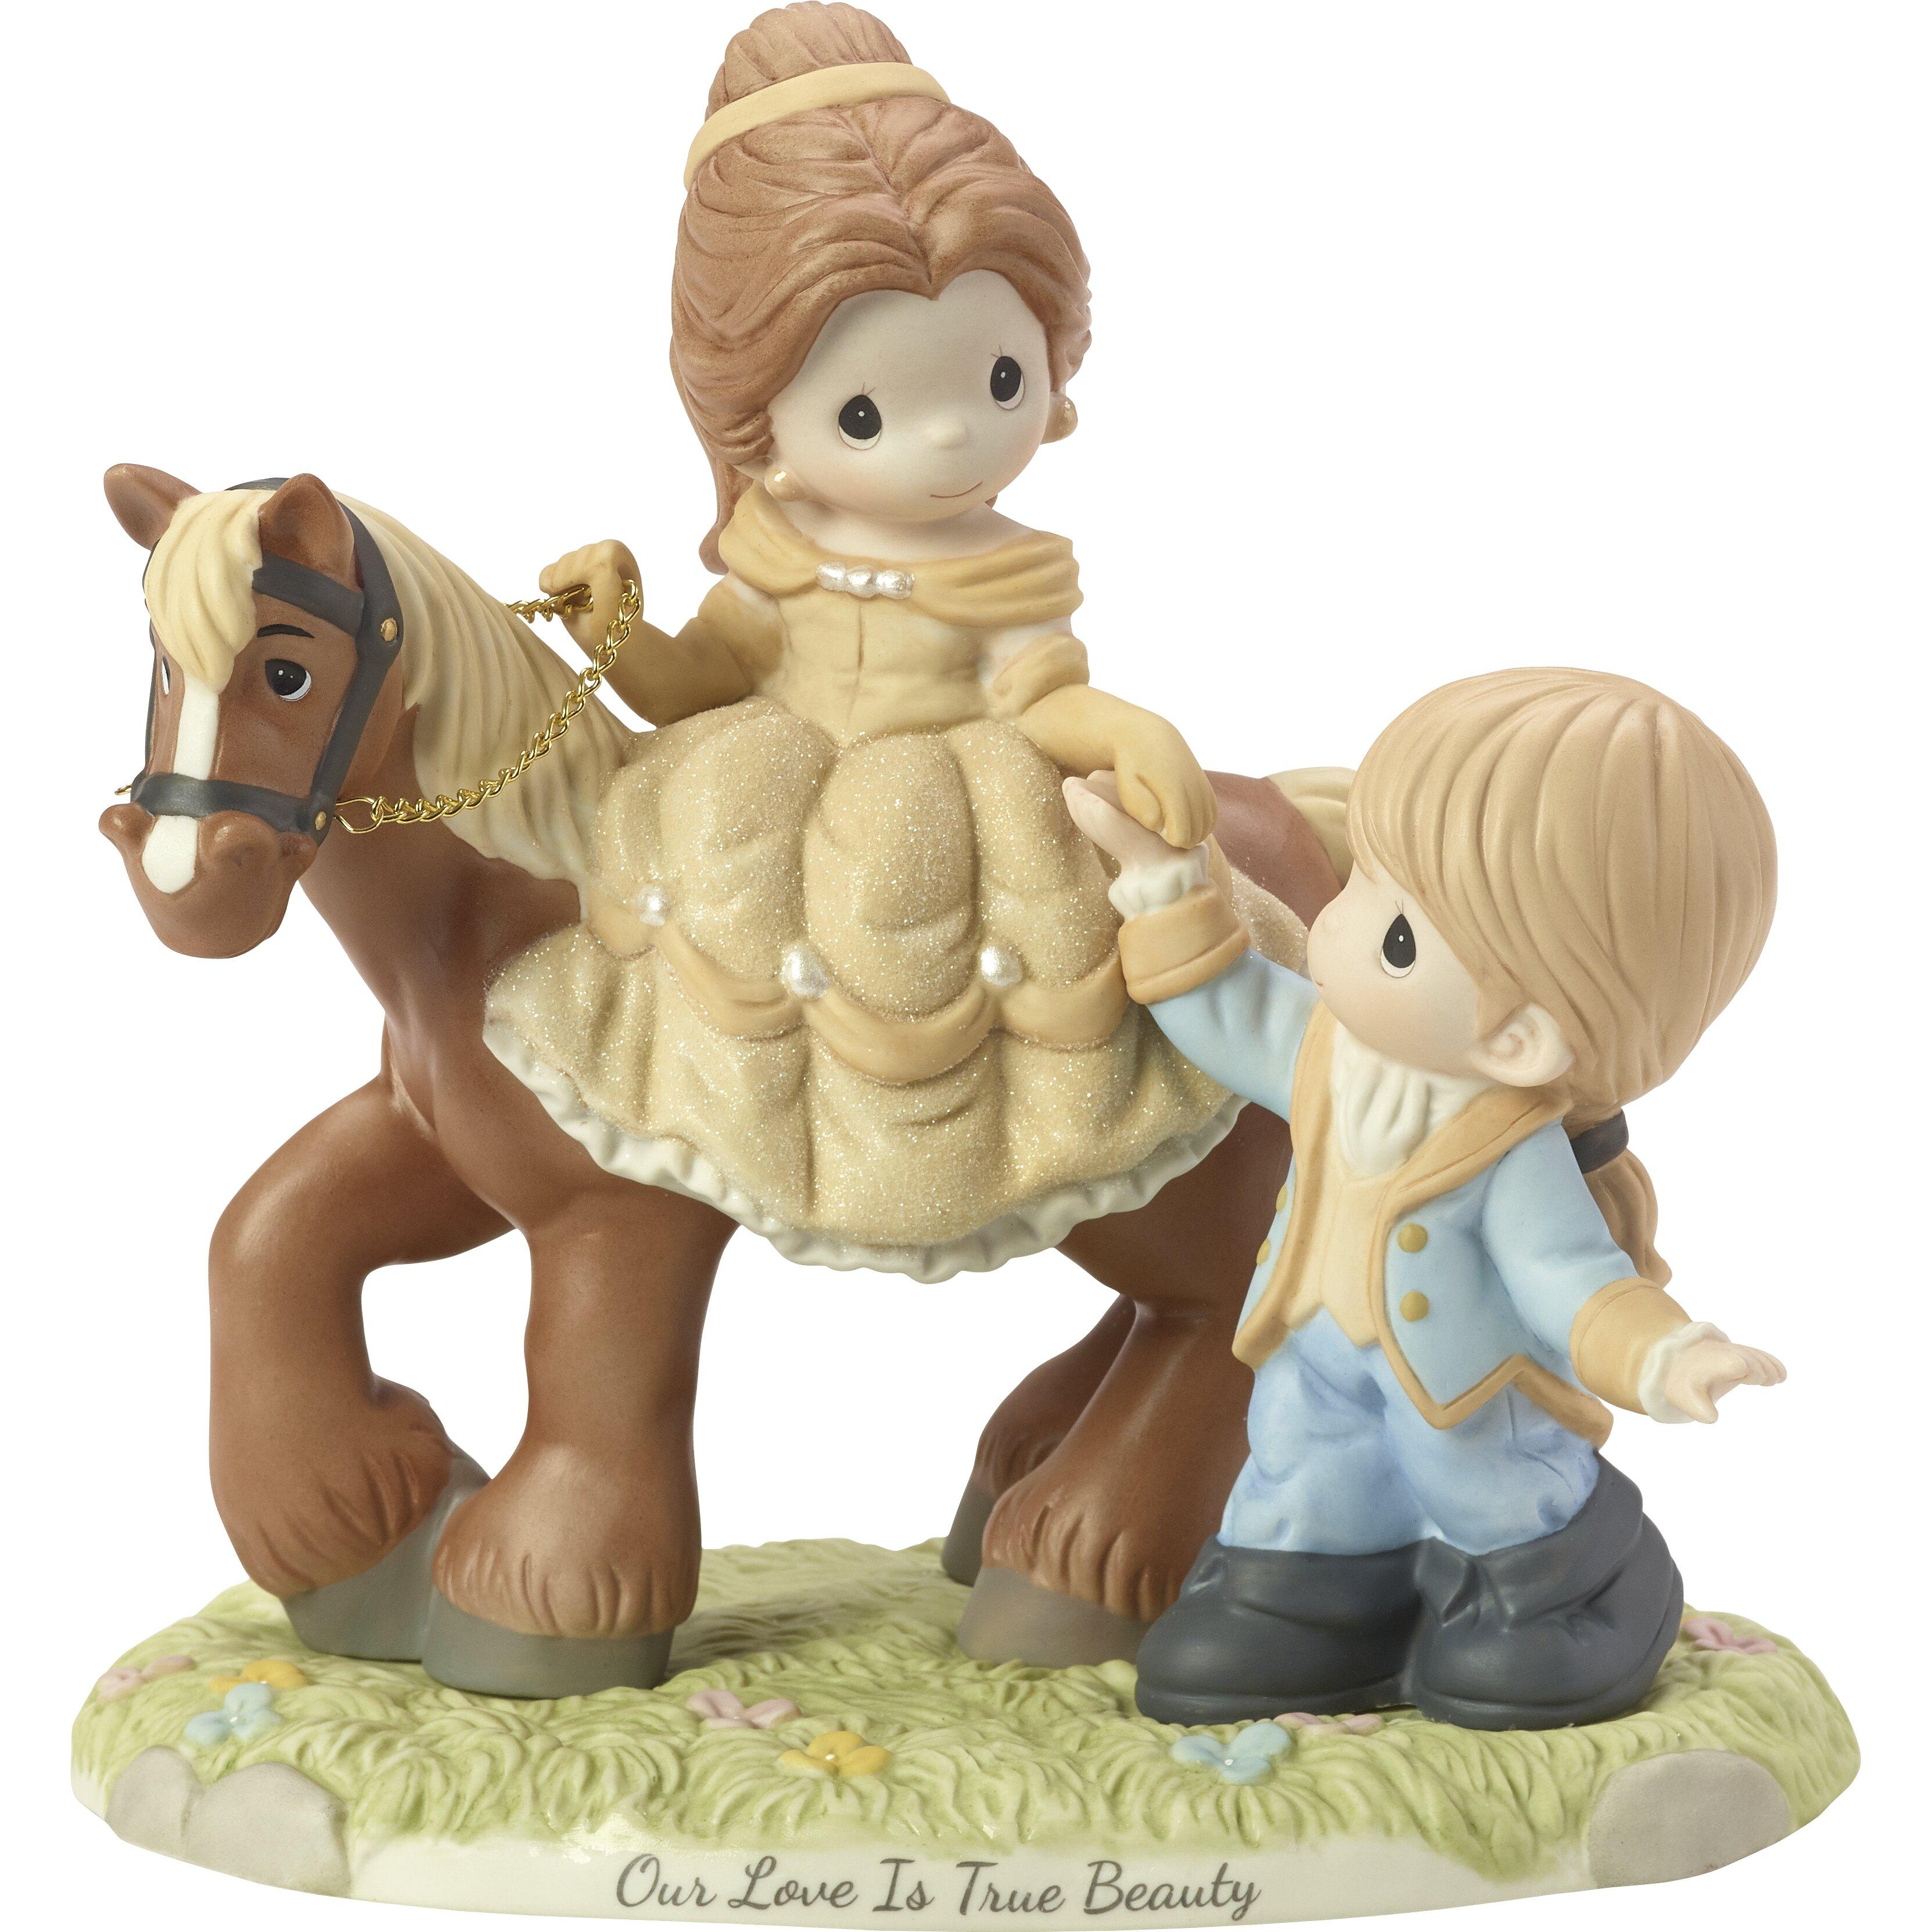 Precious Moments Disney Limited Edition Belle And Prince Adam Figurine Wayfair